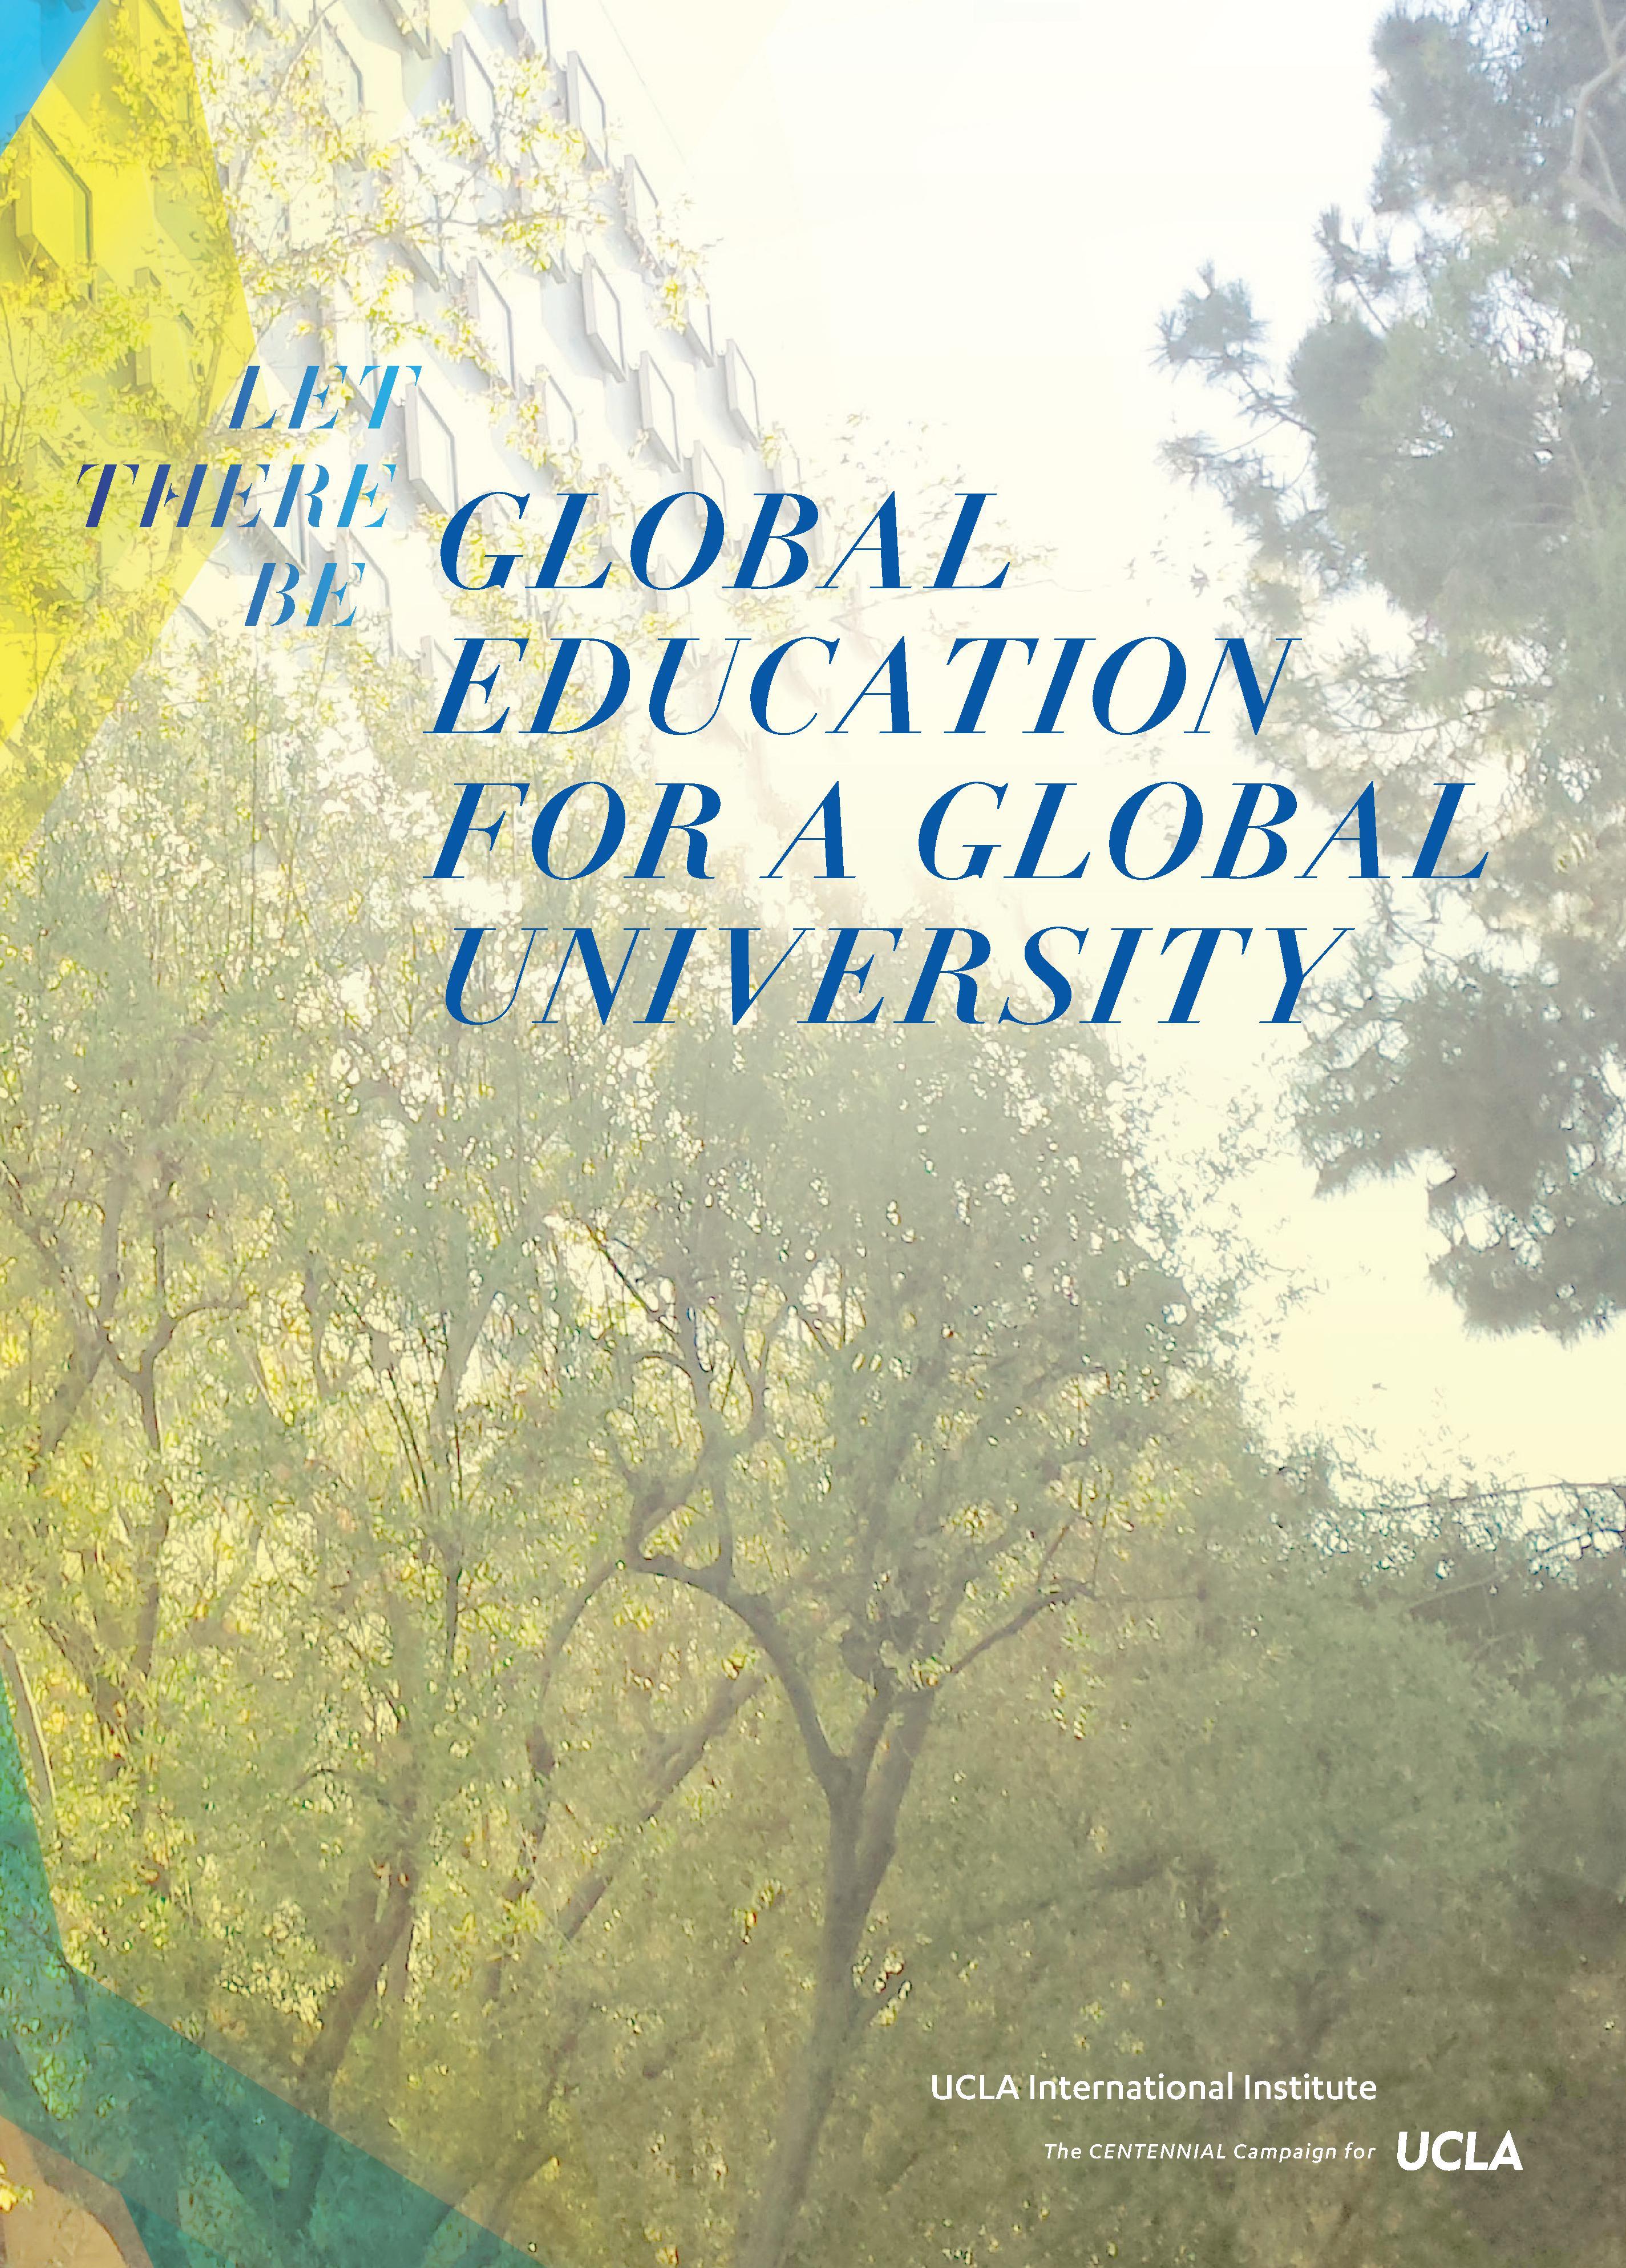 Download International Institute Briefing Brochure